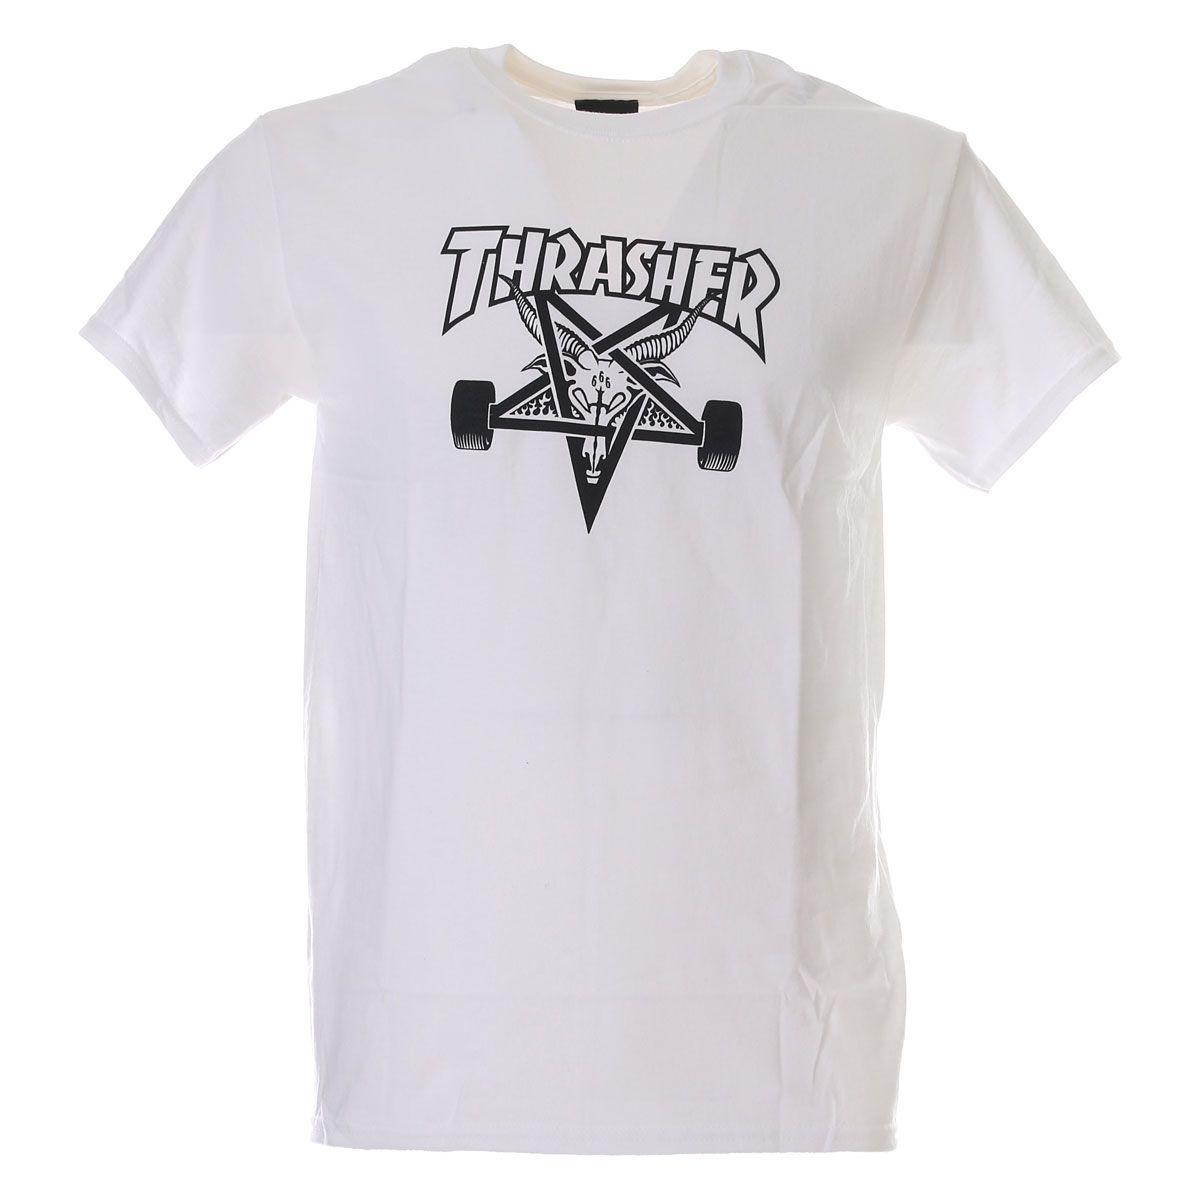 Thrasher T-Shirt Skategoat White